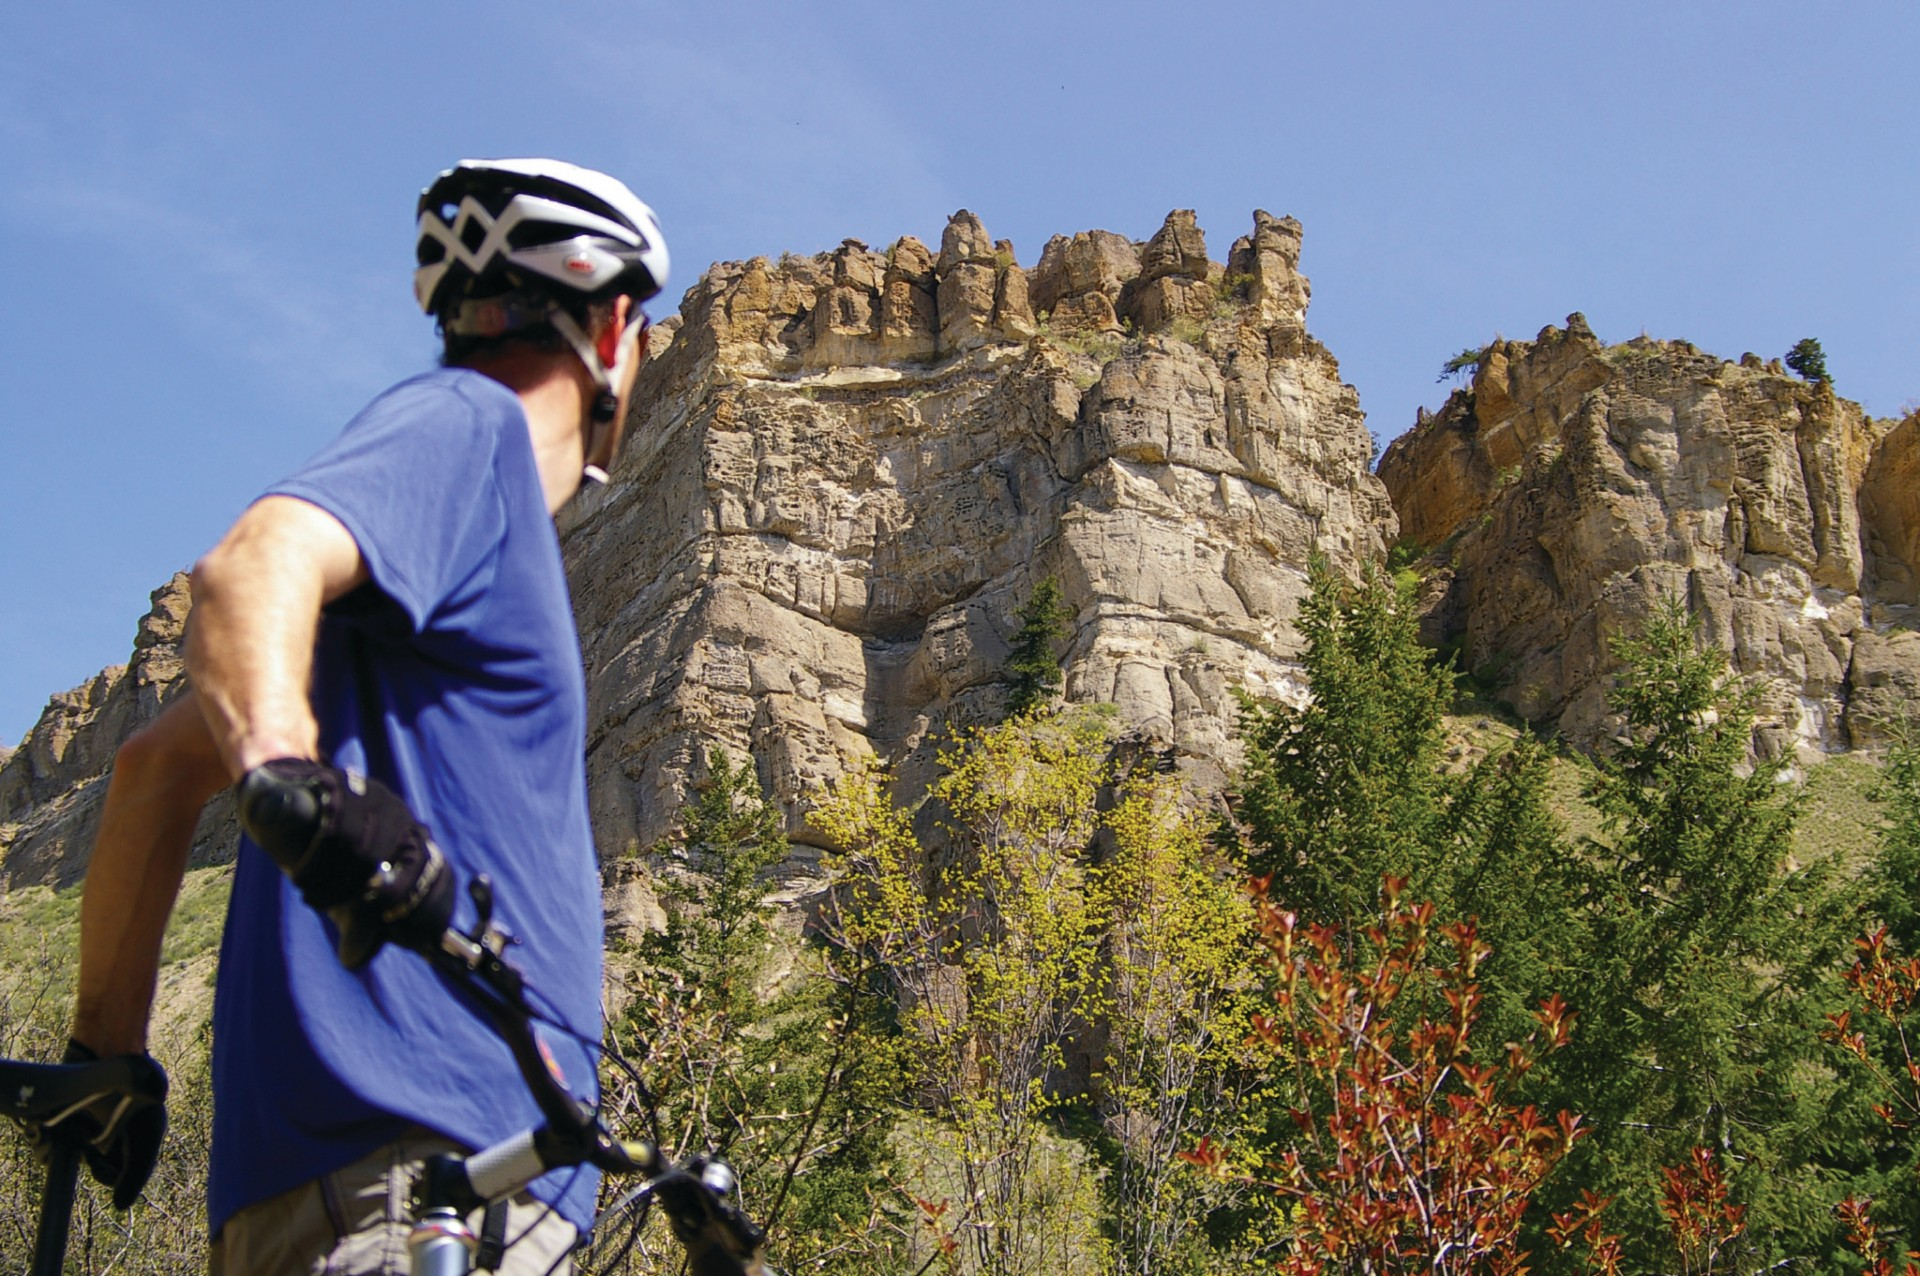 Pipestone Canyon